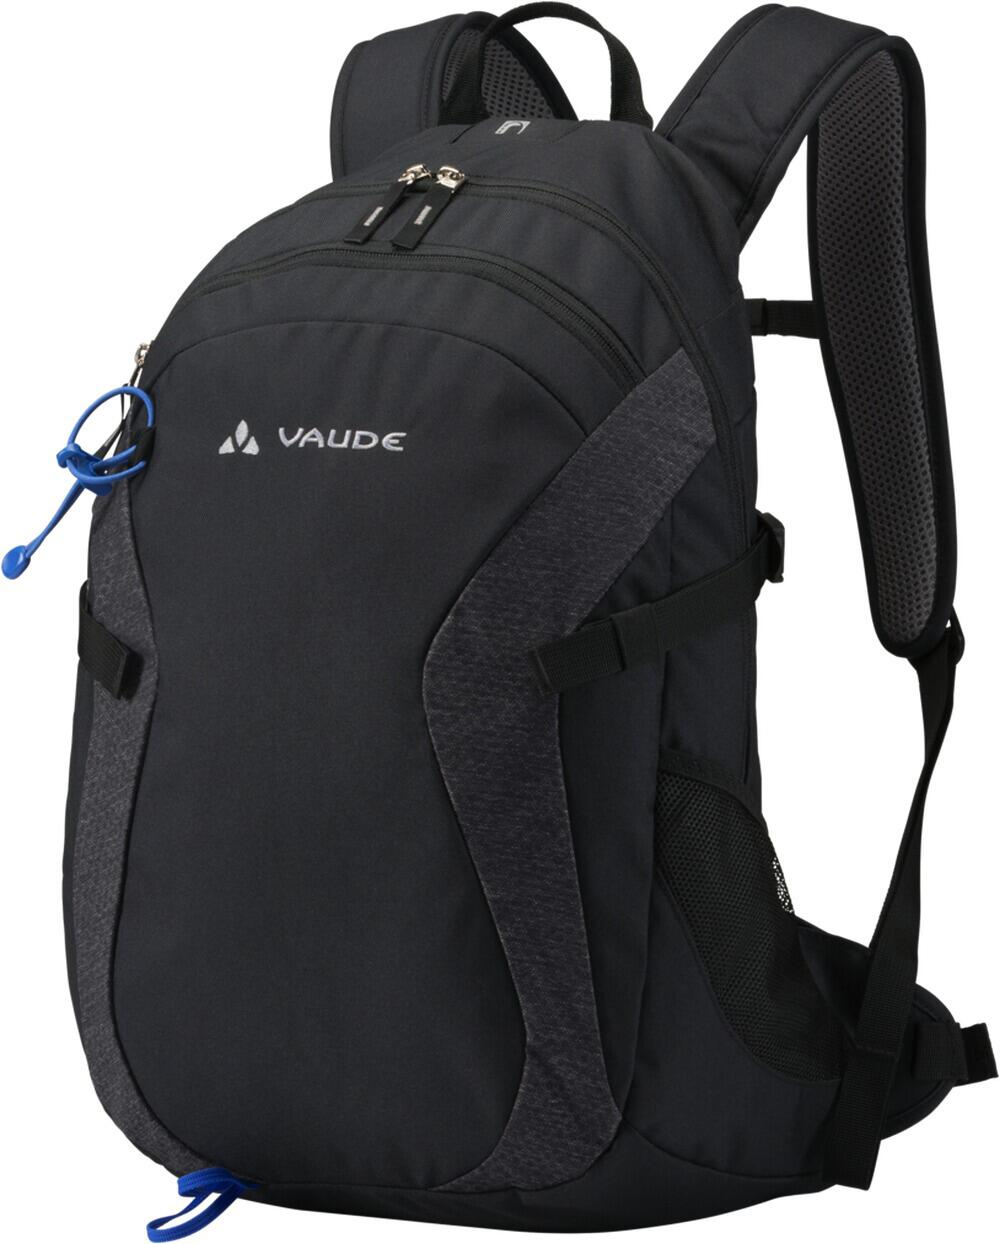 vaude-davenna-ii-24-rucksack-farbe-010-black-